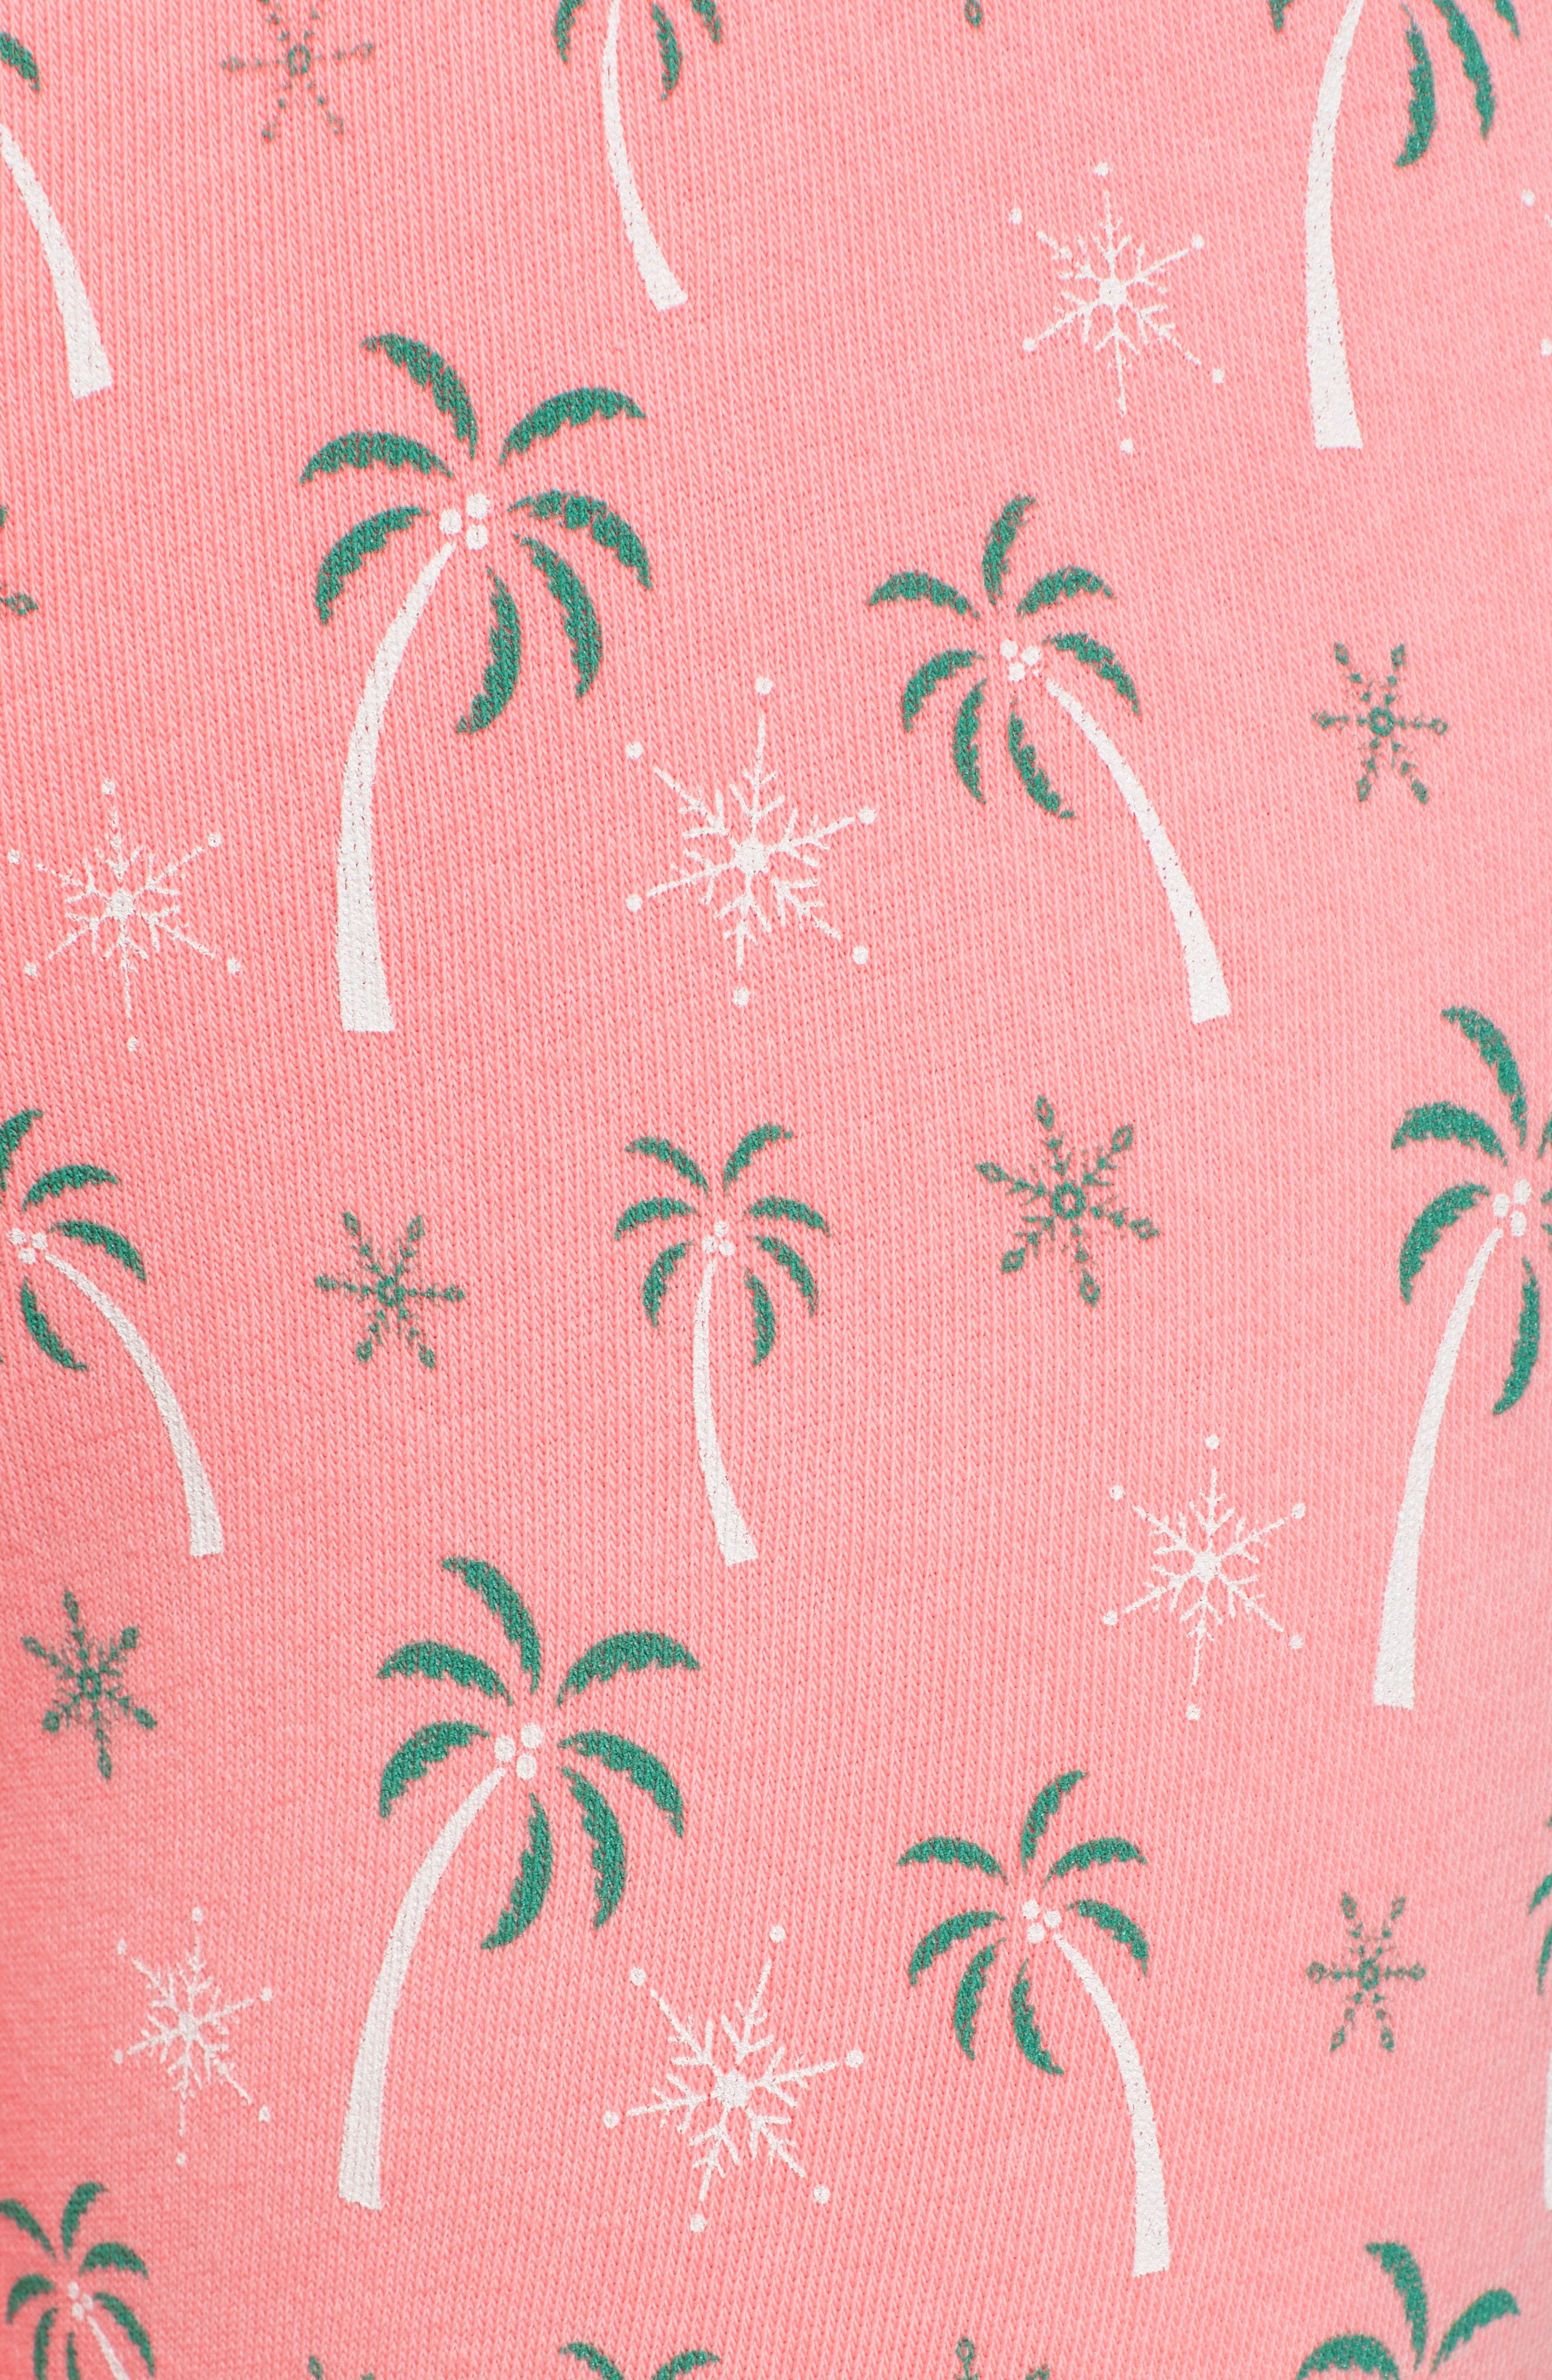 Tropical Christmas Sweatpants,                             Alternate thumbnail 5, color,                             NEON SIGN